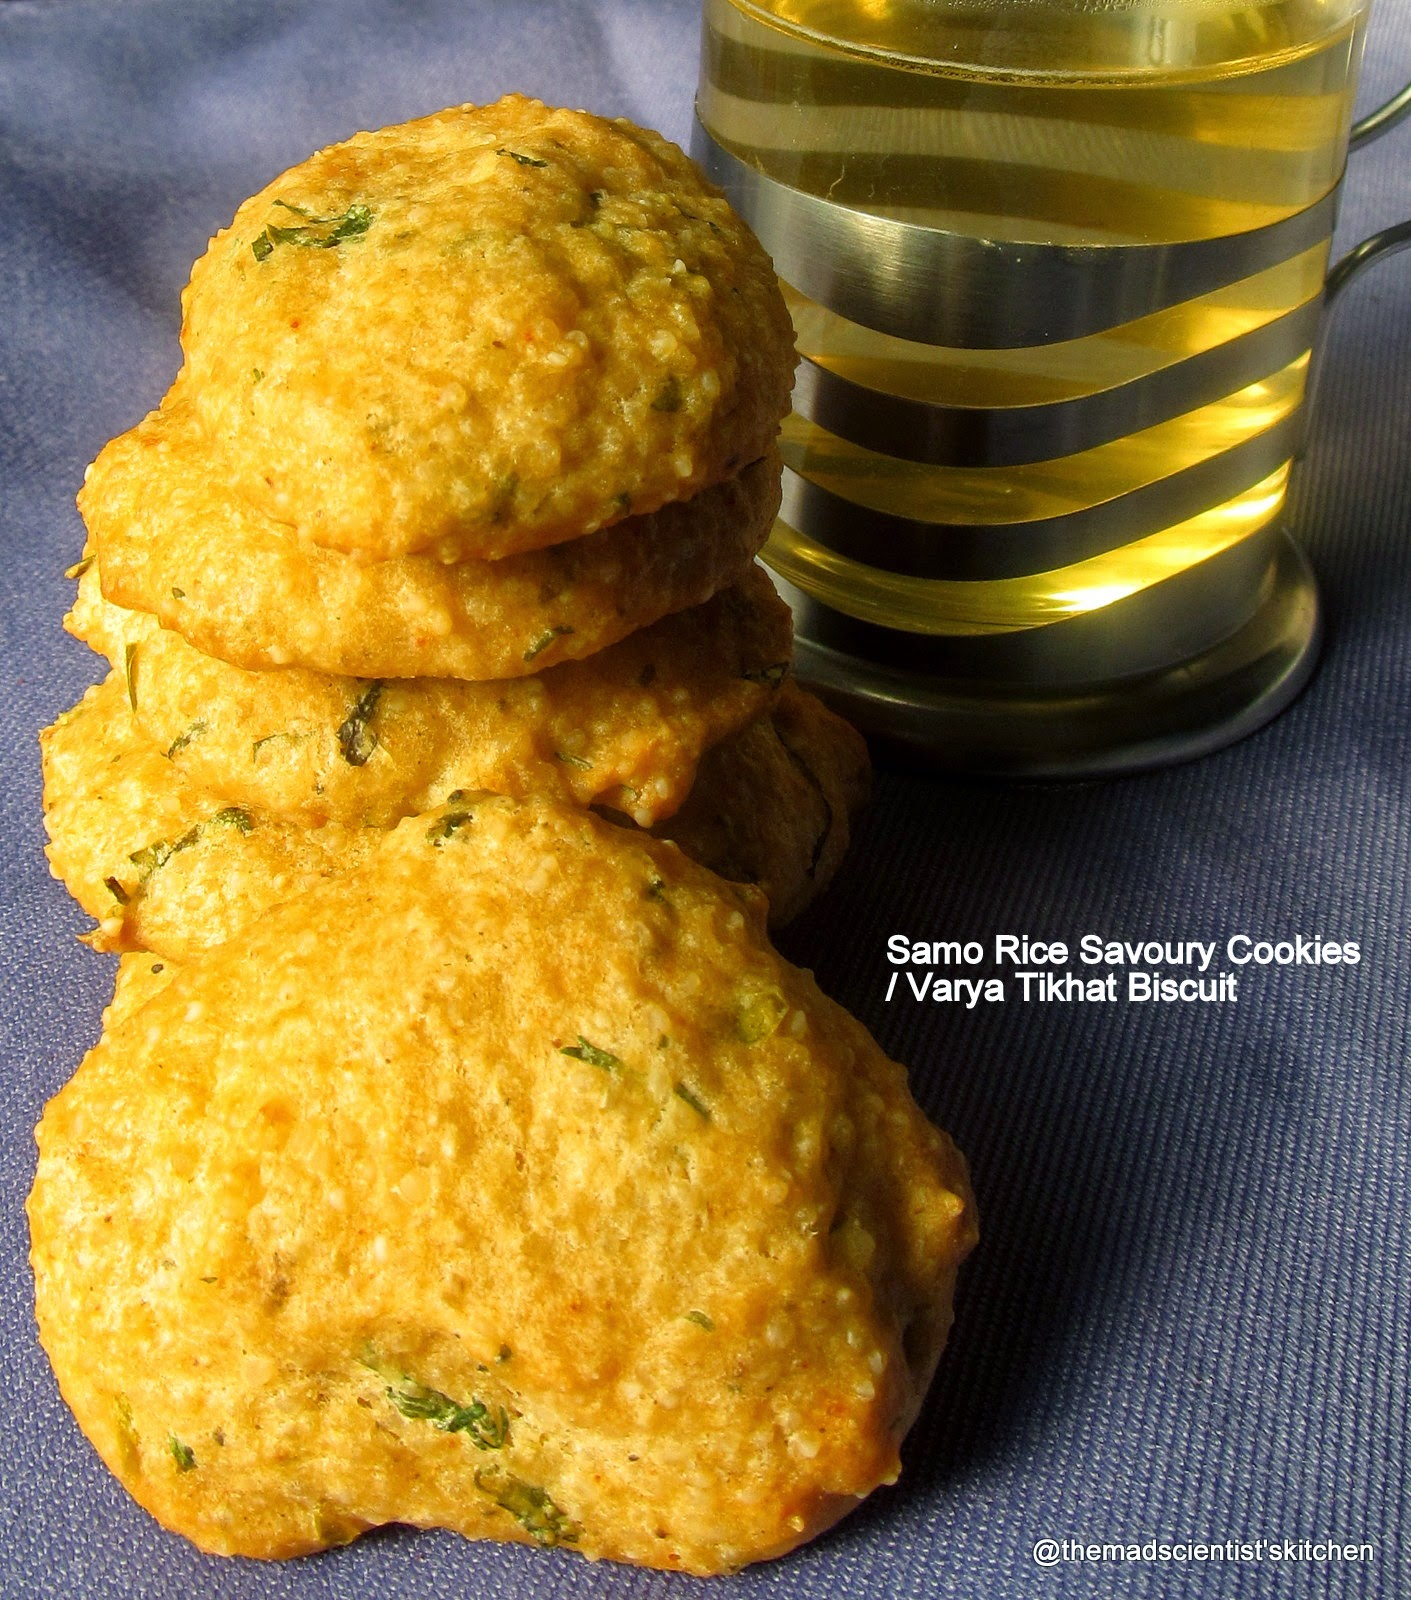 Samo Rice Savoury Cookies/ Varya Tikhat Biscuit